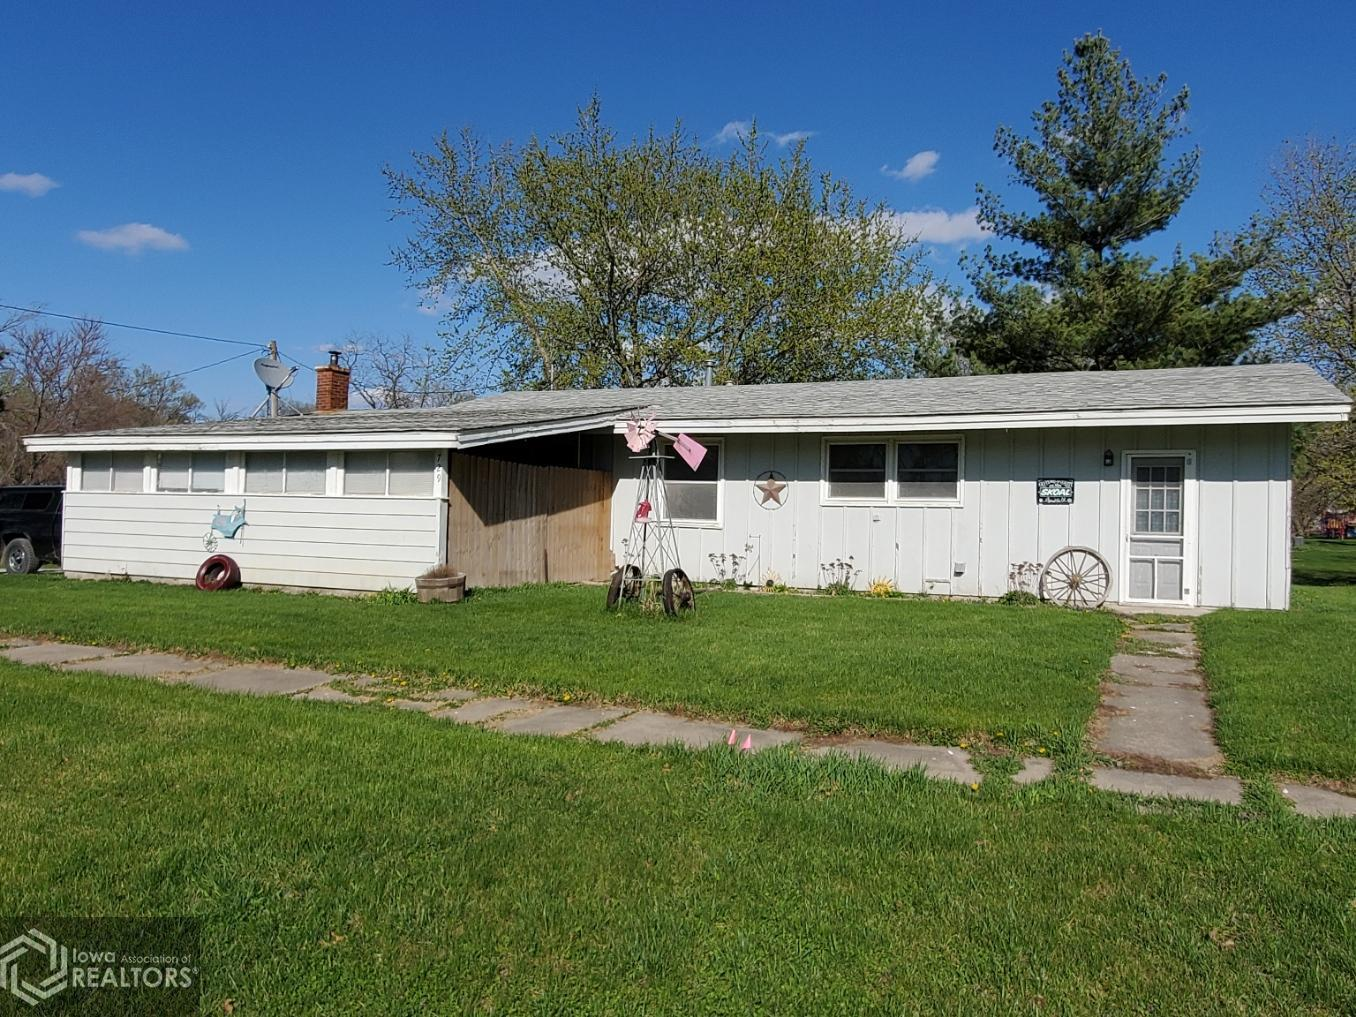 729 Maple, Murray, Iowa 50174-1003, 2 Bedrooms Bedrooms, ,1 BathroomBathrooms,Single Family,For Sale,Maple,5740823